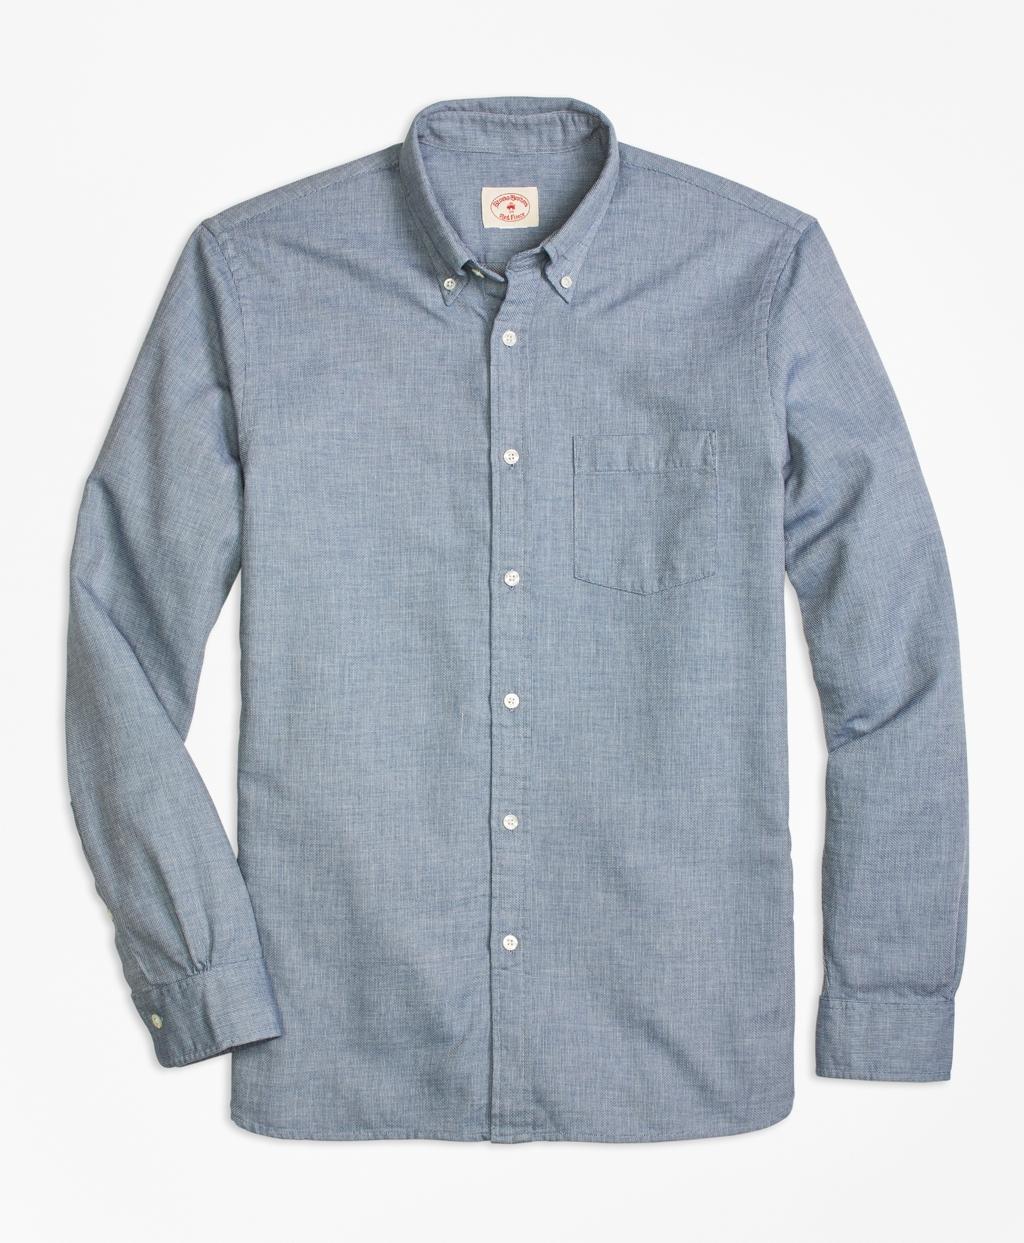 Lyst brooks brothers pique stitch sport shirt in blue for Brooks brothers sports shirts